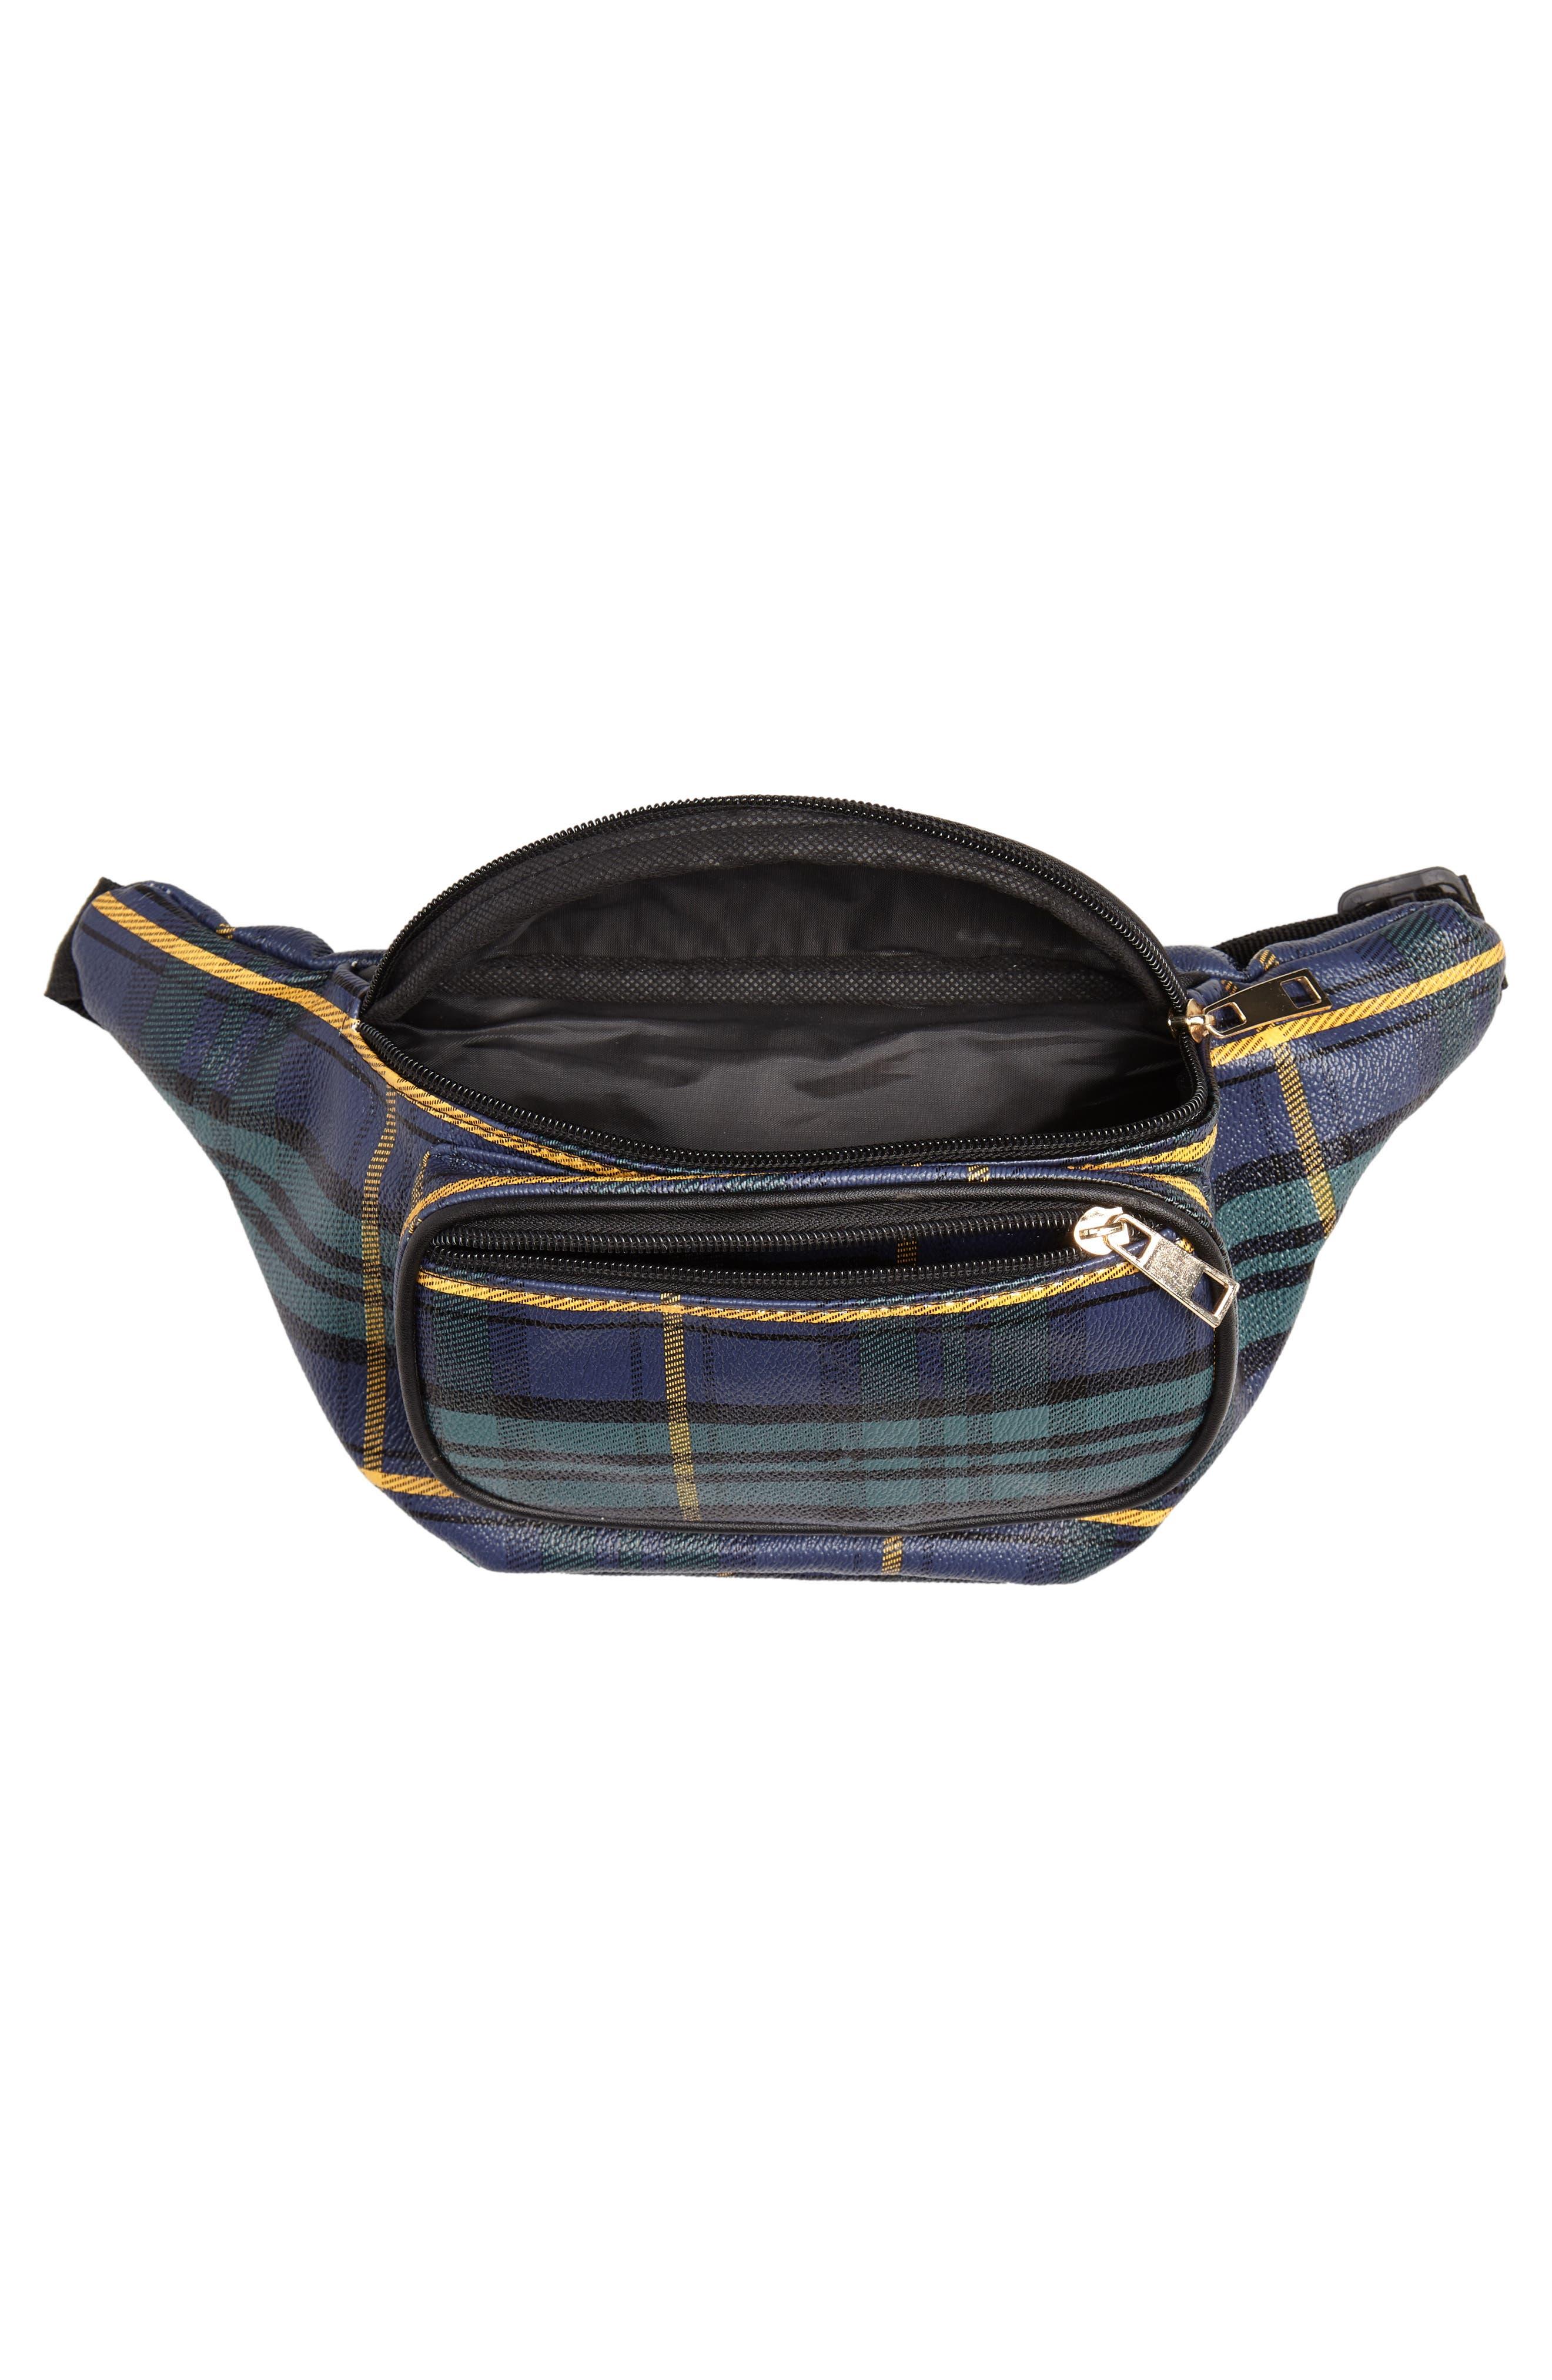 JANE & BERRY, Plaid Belt Bag, Alternate thumbnail 5, color, 300